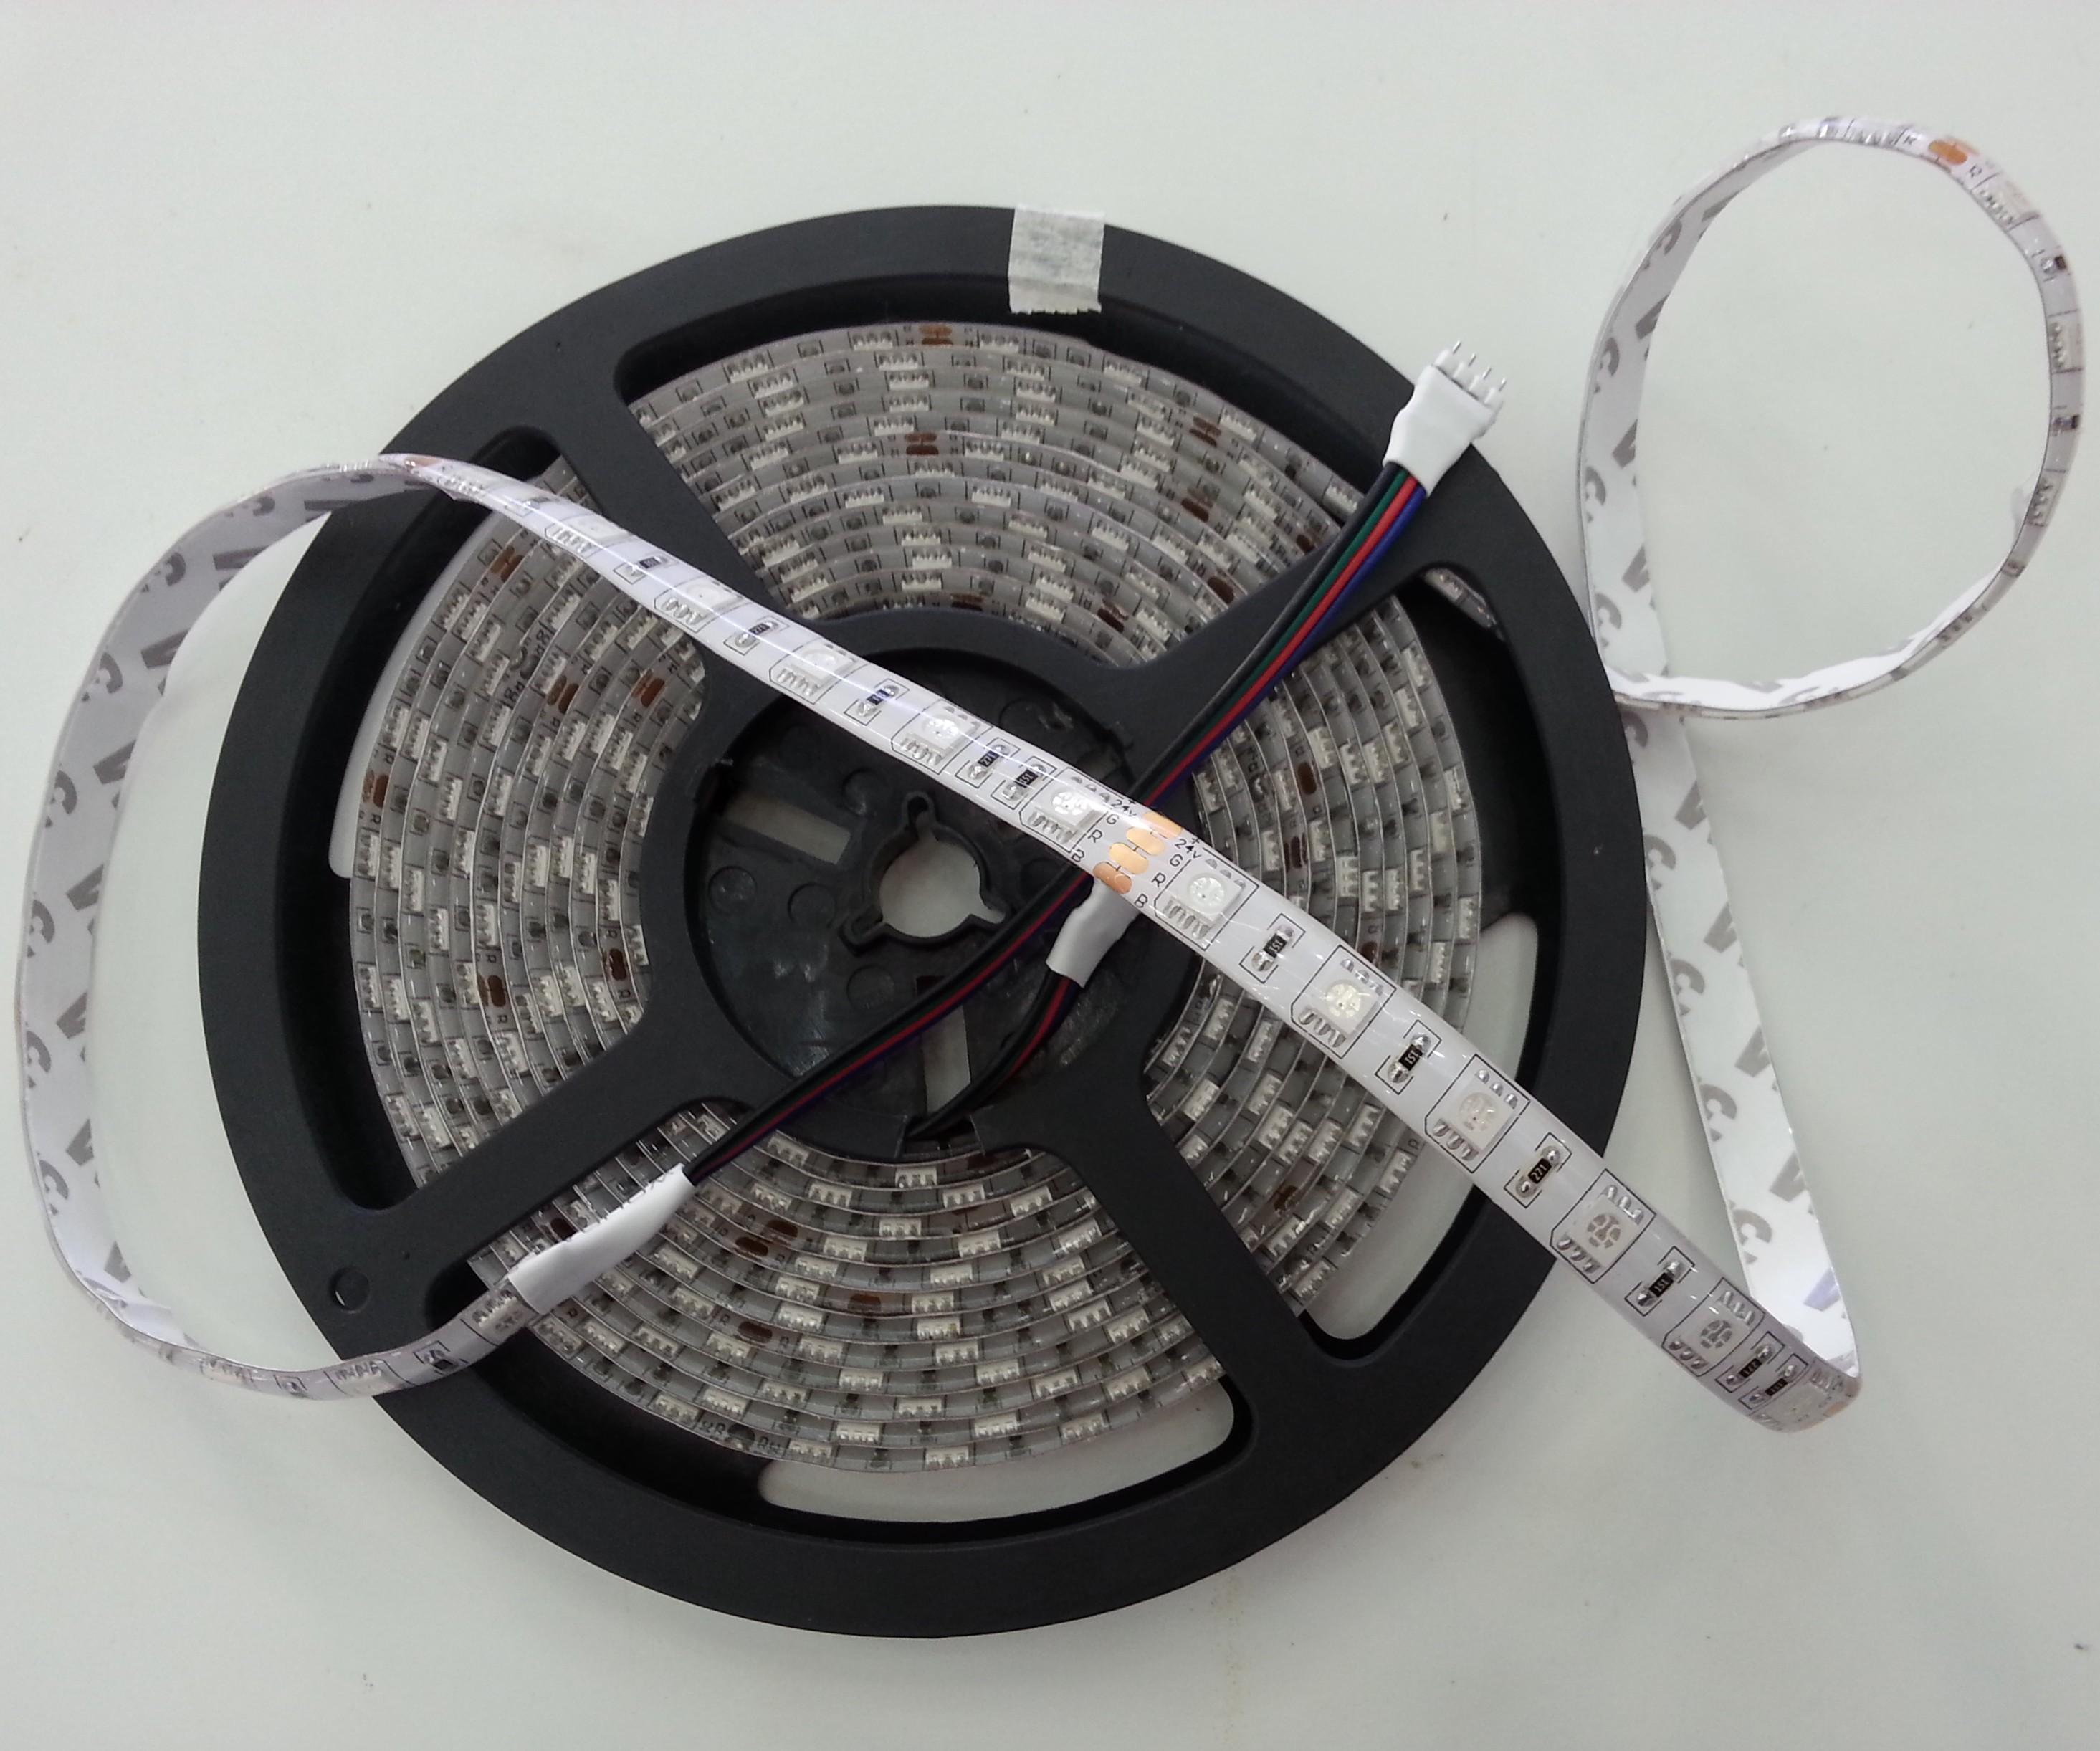 Ultra Bright Epistar Smd 5050 Rgb Led Strip 5m 300led Flex